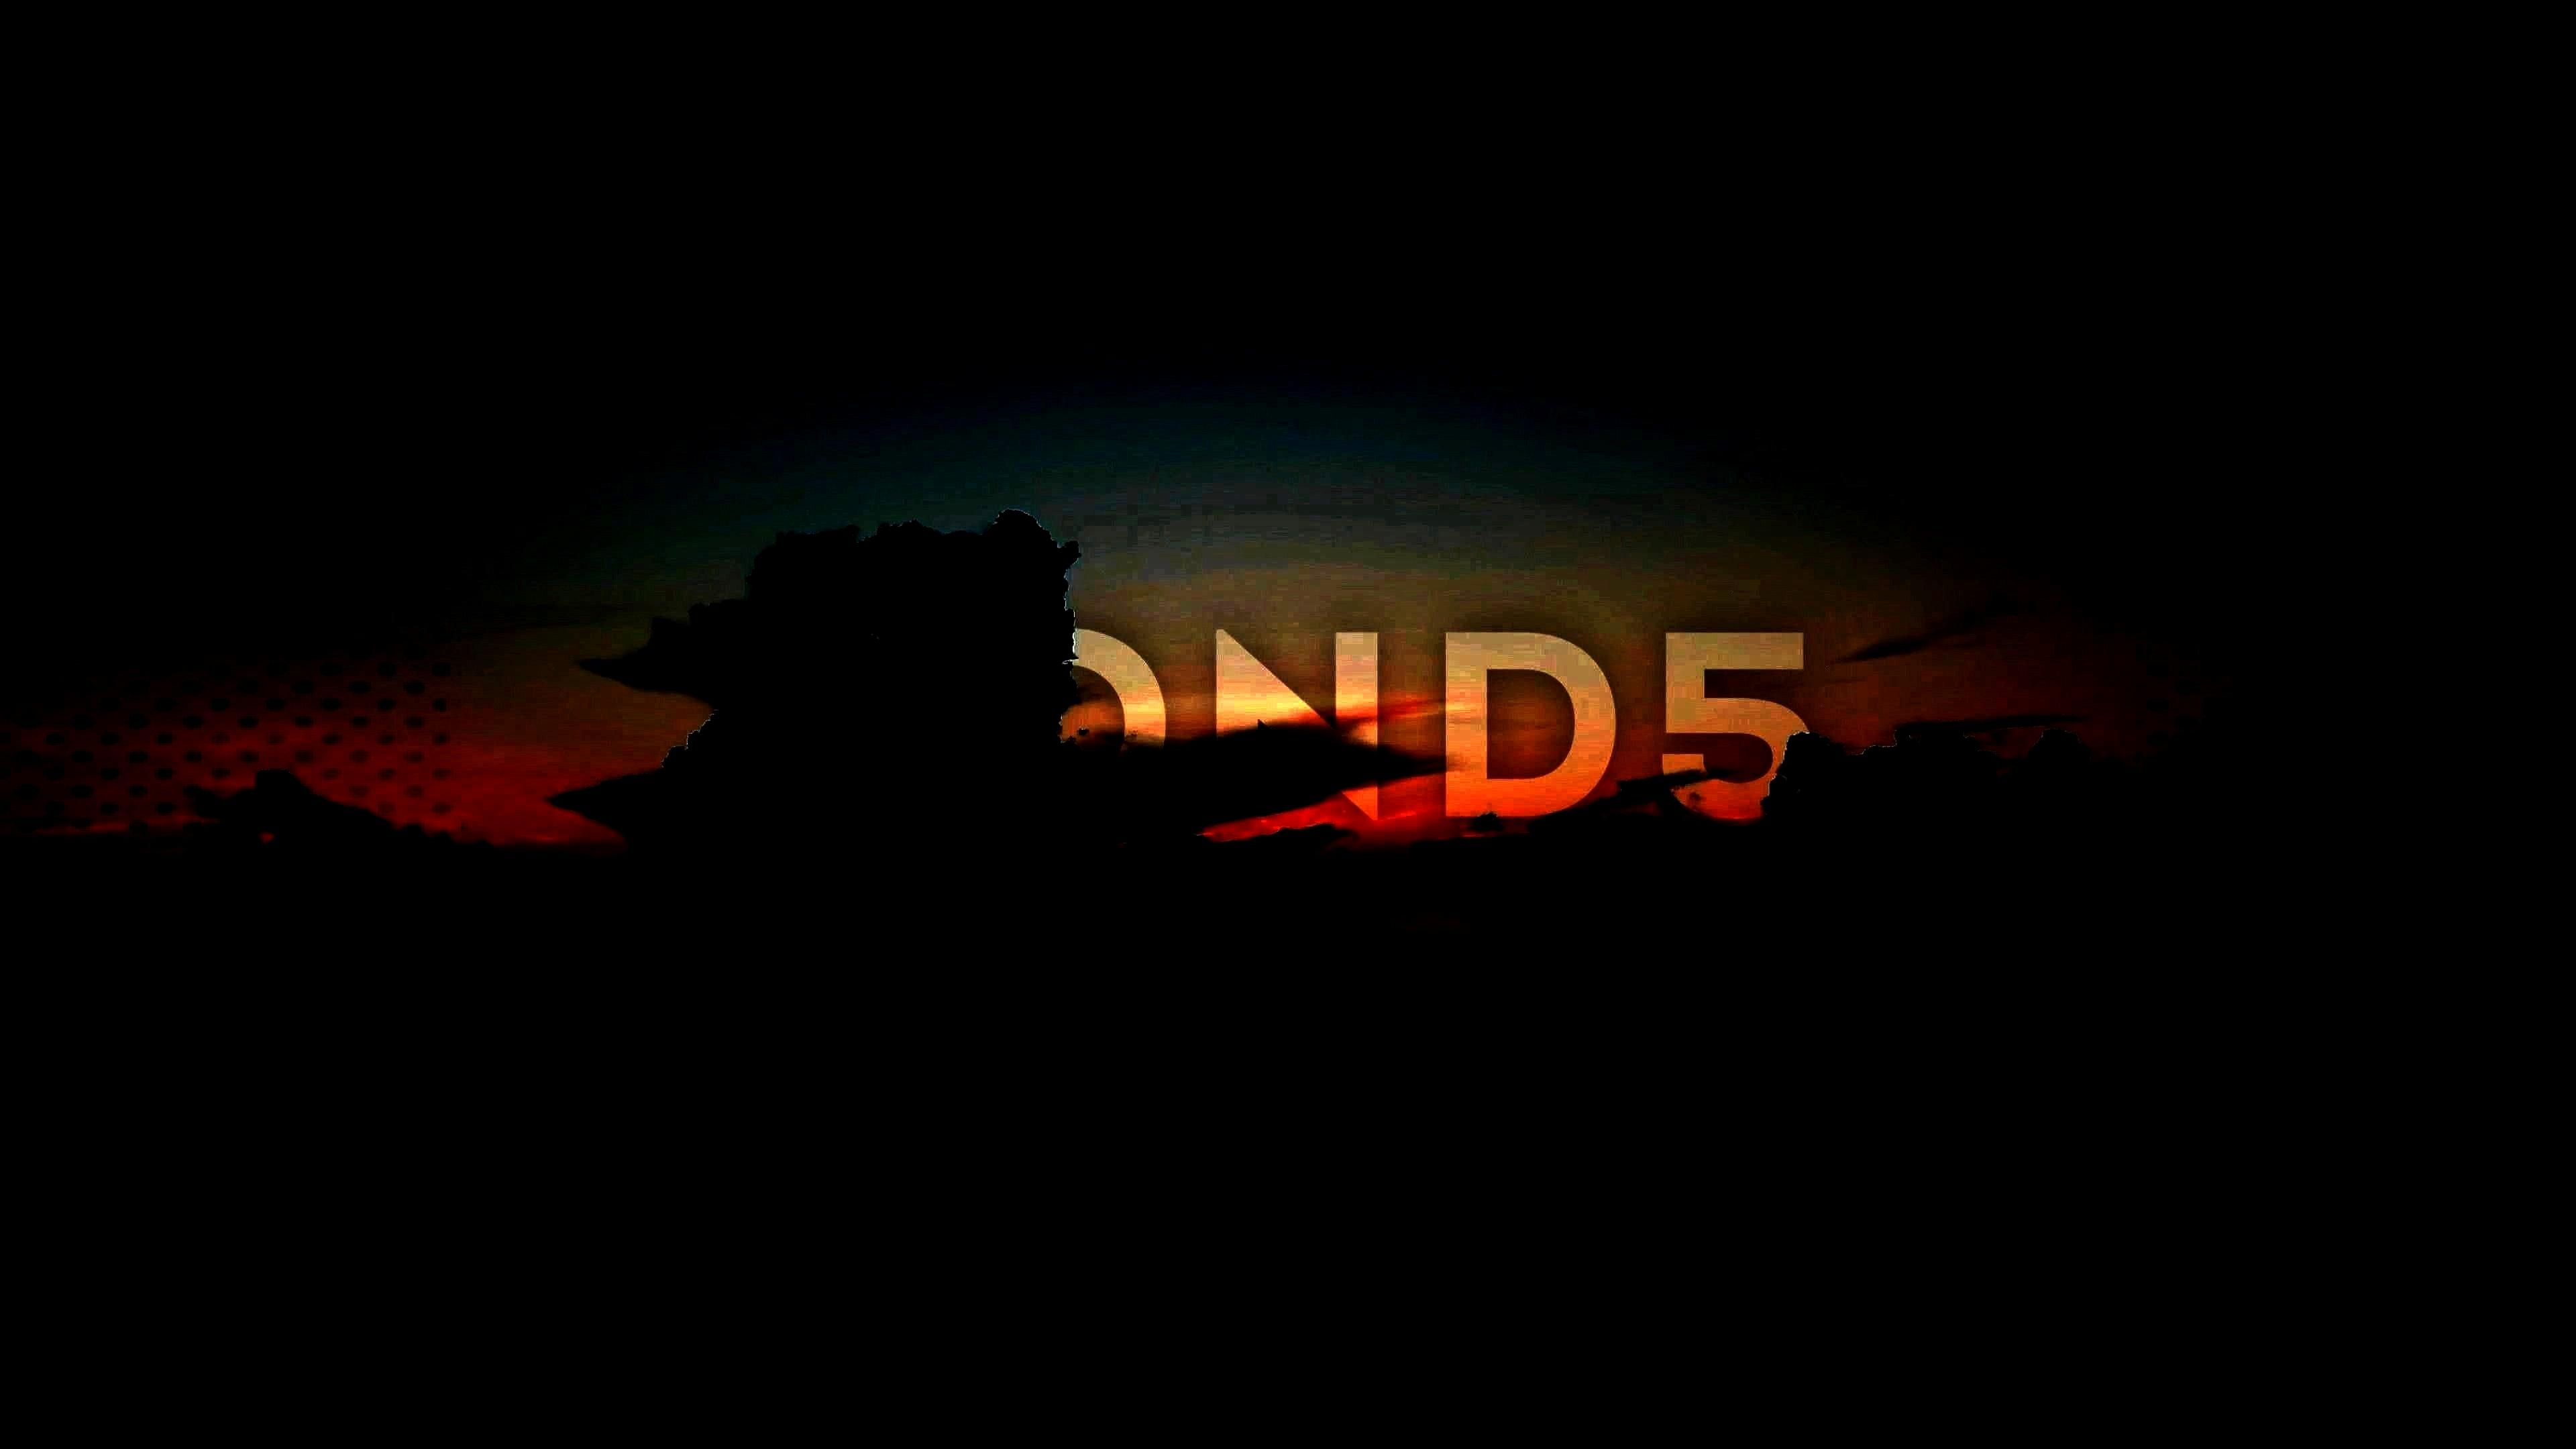 Ocean Sunrises and Sunsets Series 4K Stock Footage ,#Sunrises#Ocean#Beautiful#SunsetsOcean Sunrises